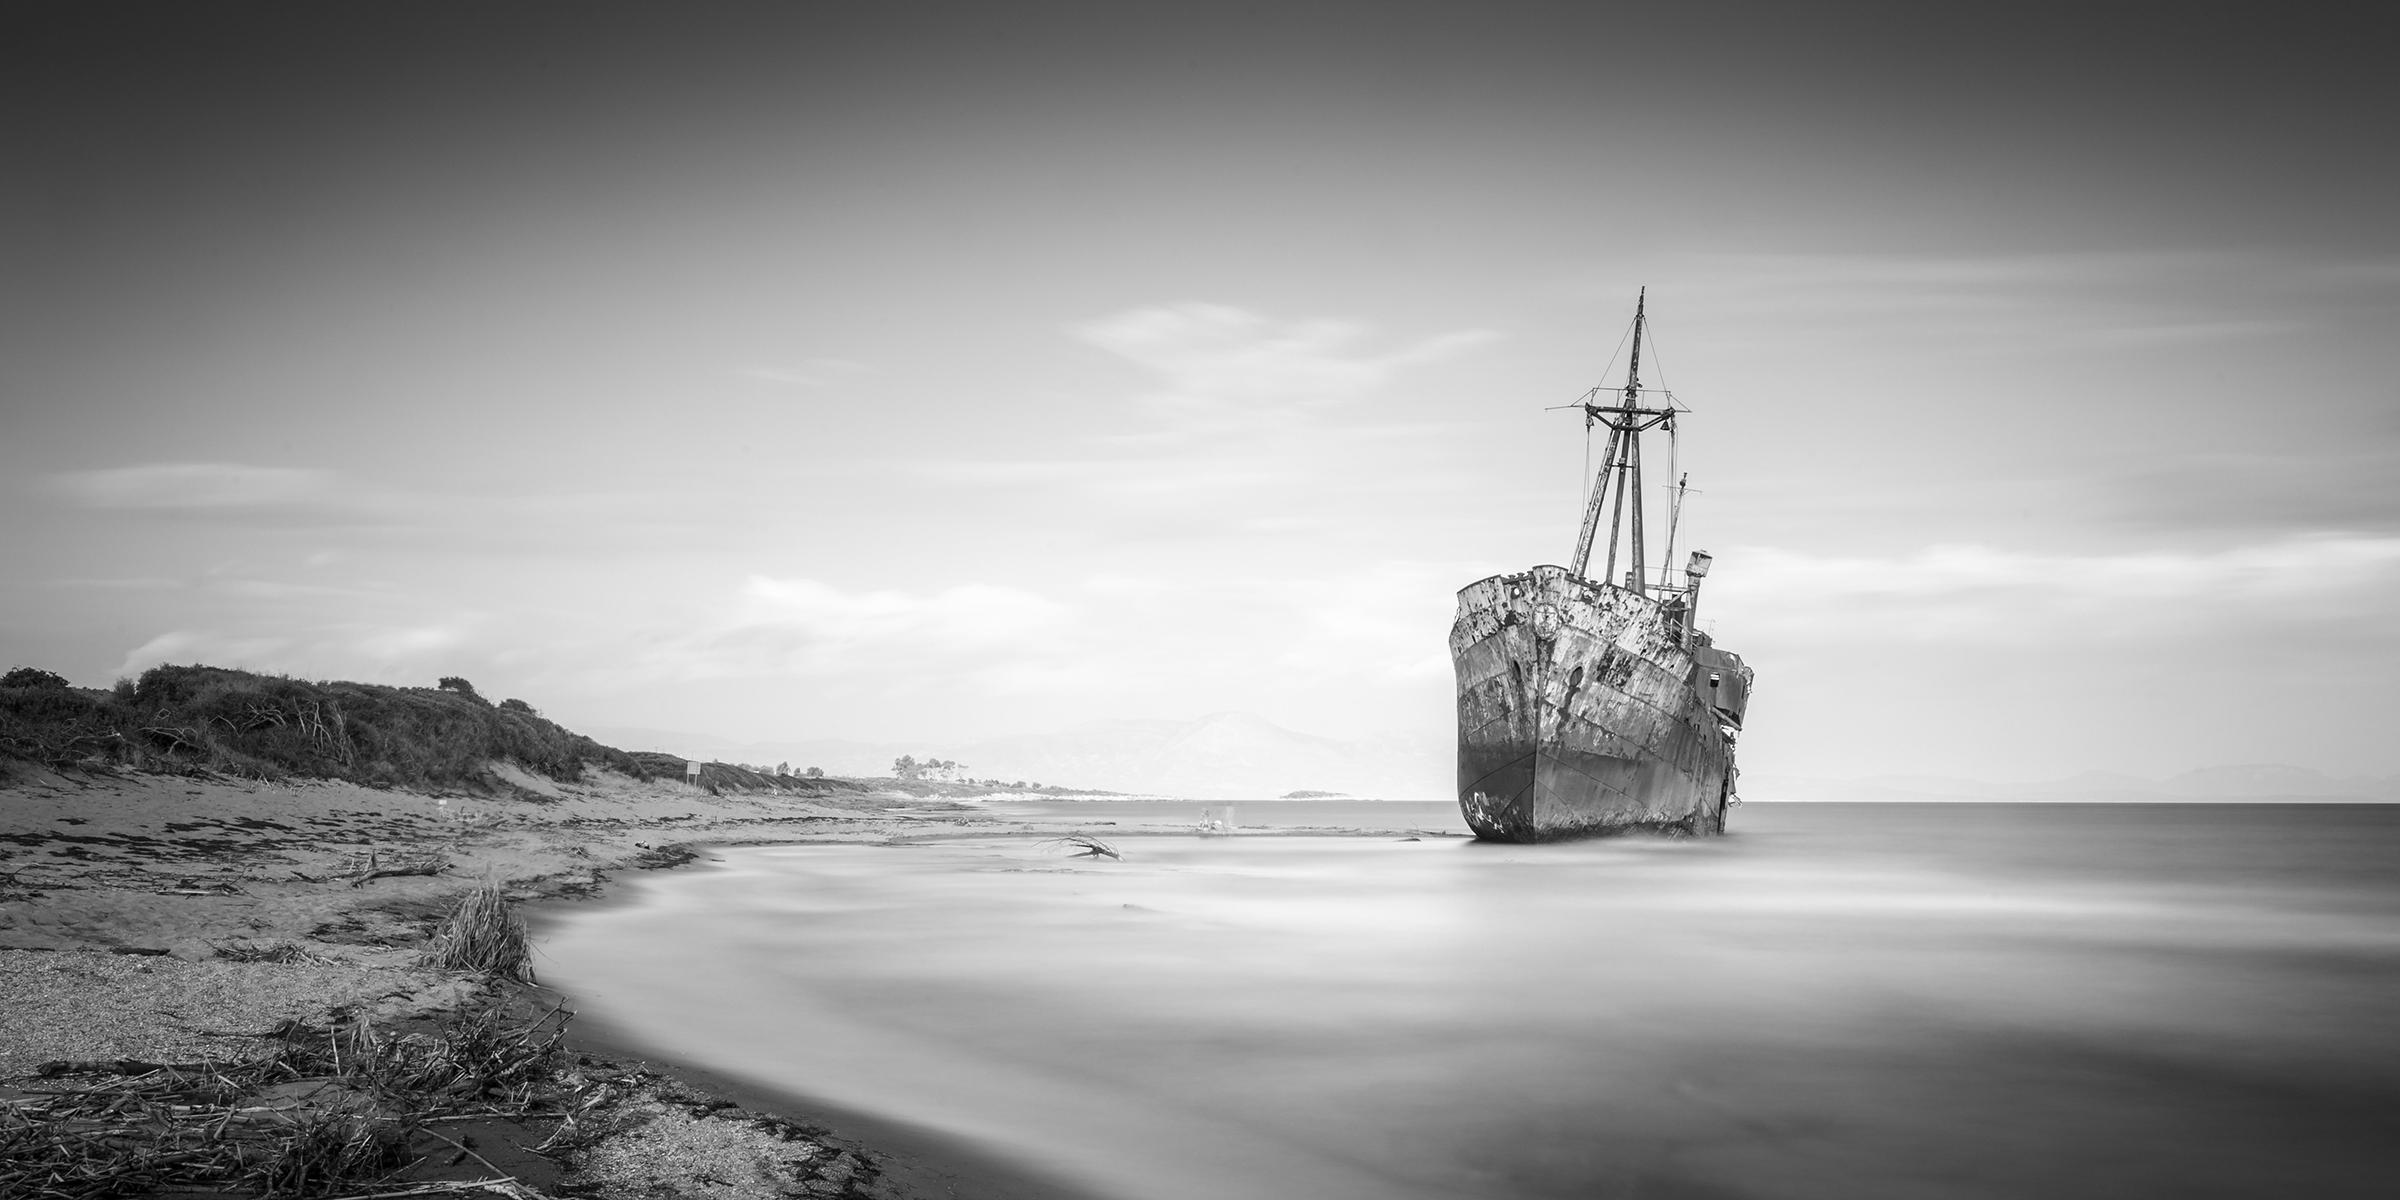 08_Gythio shipwreck2